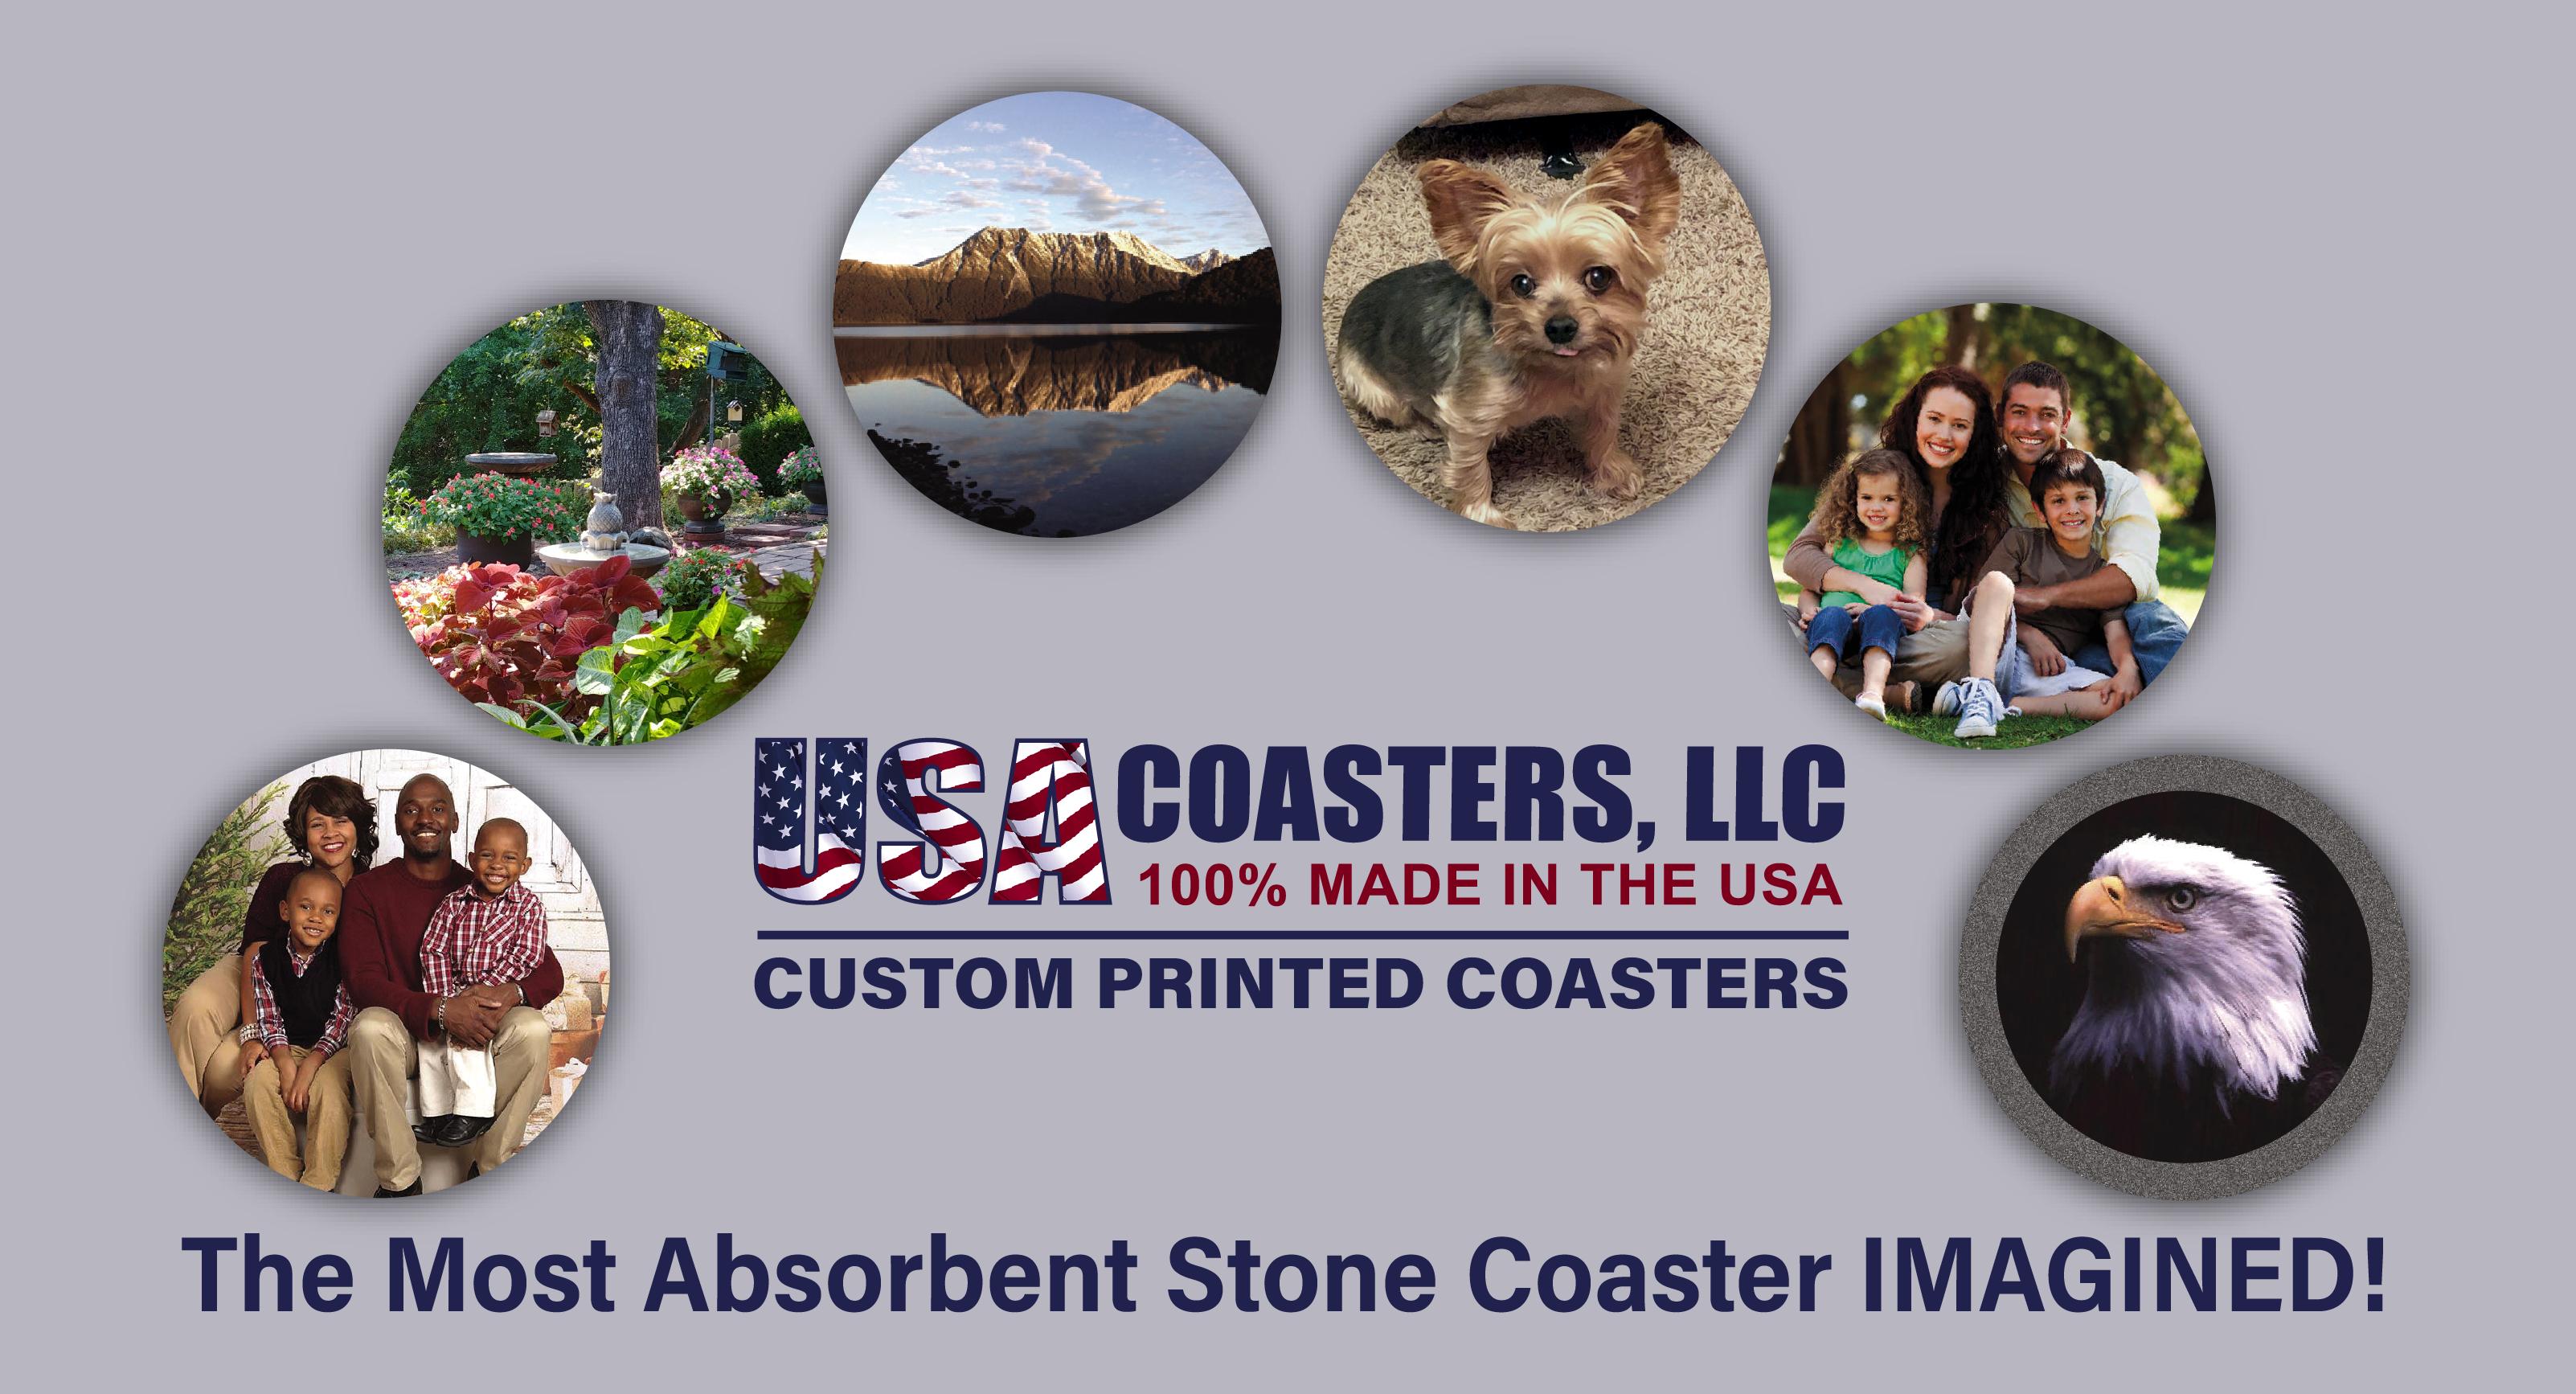 USA Coasters, LLC